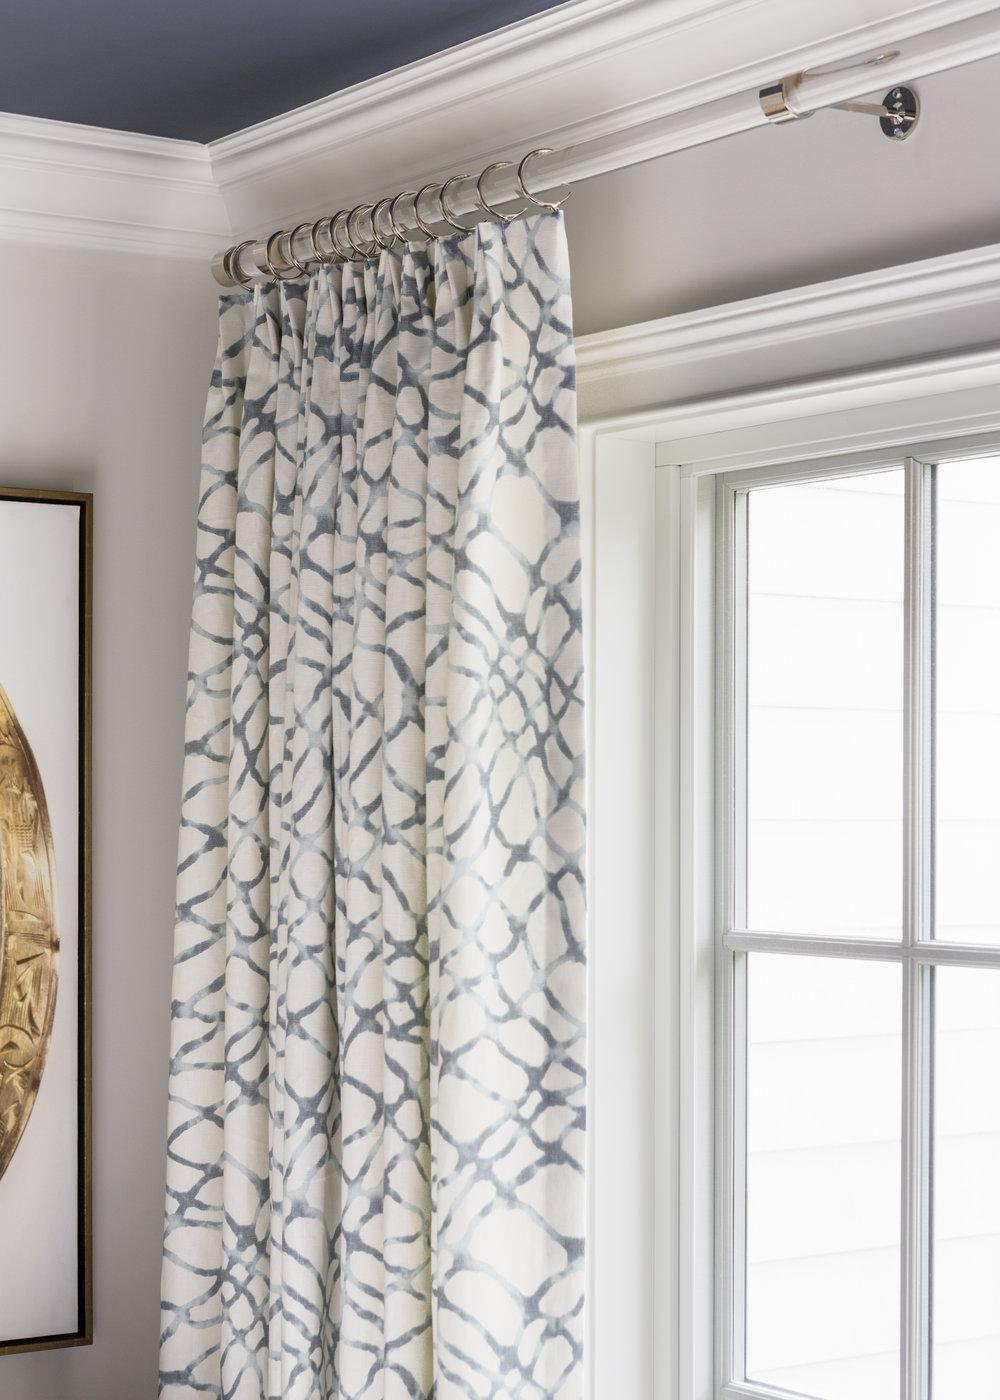 10 Dallianc_Halper_Details_curtains.jpg